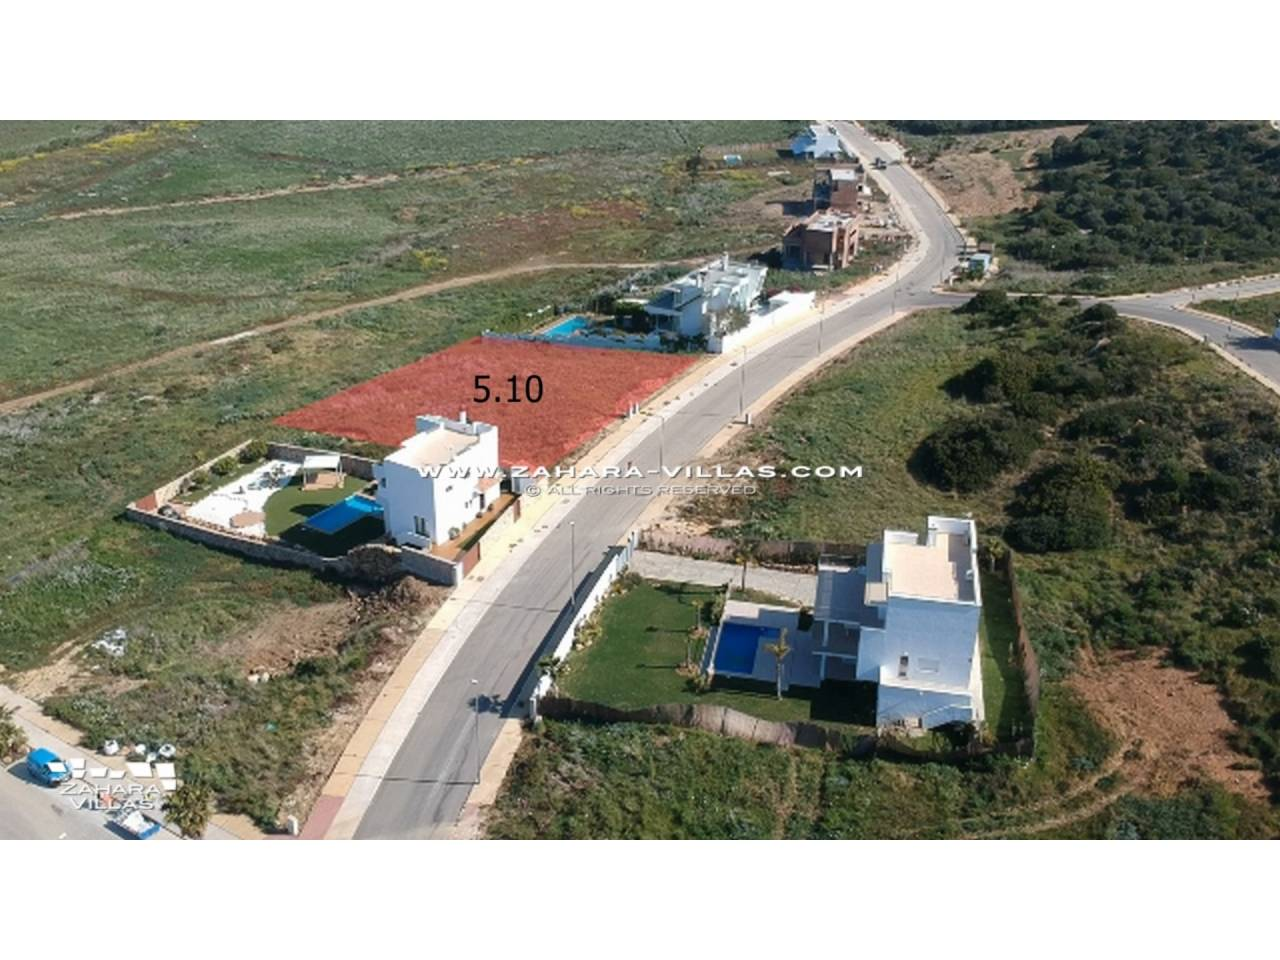 Imagen REF.000036 ubicada en Atlanterra